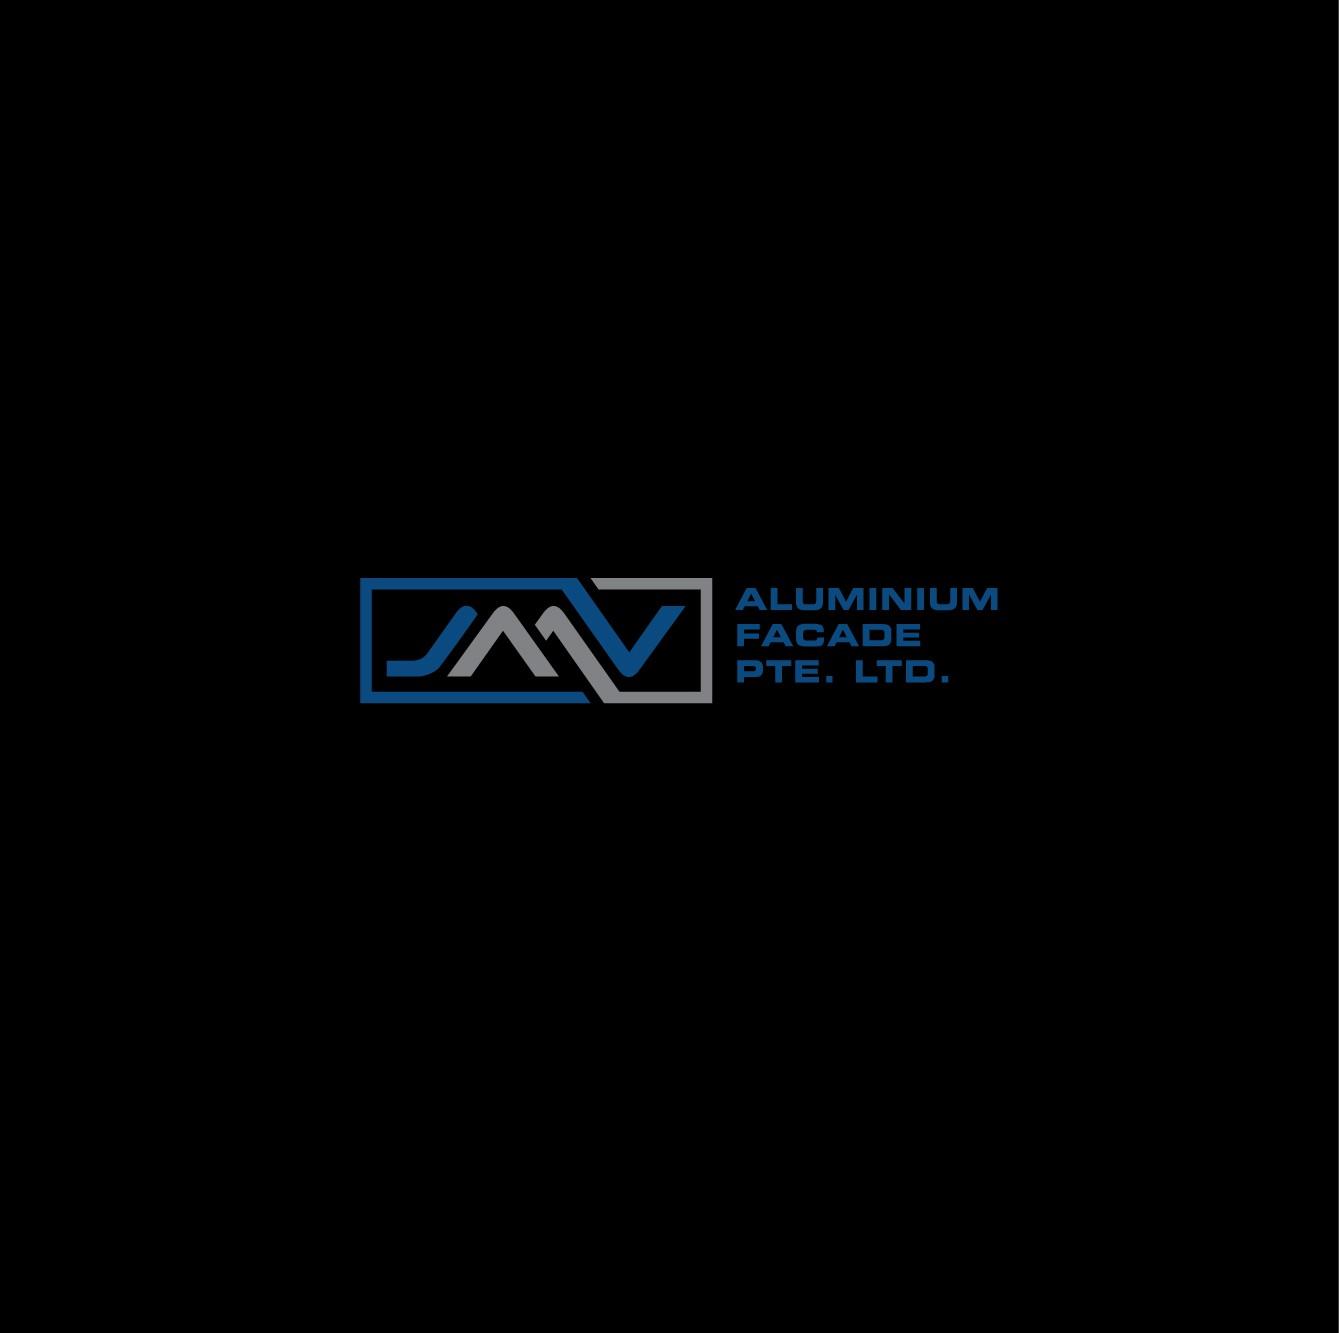 JMV New Logo